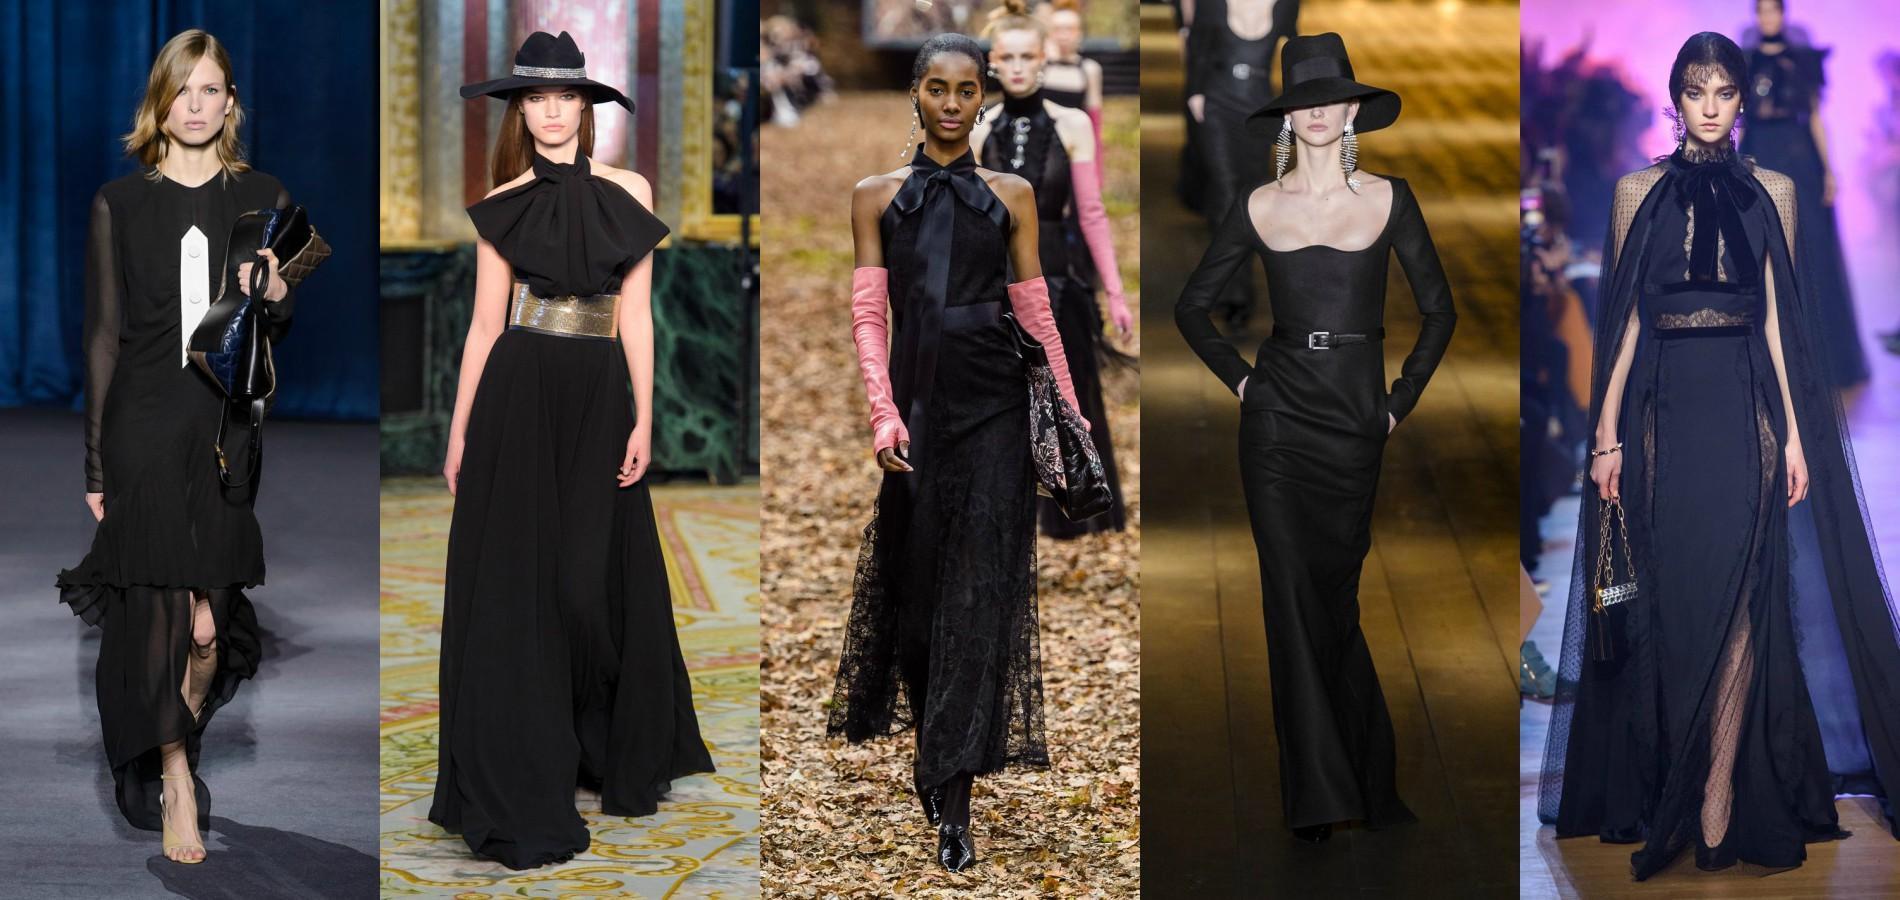 b34cf97dc8b Fashion Week automne-hiver 2018-2019   la robe noire prend une ...